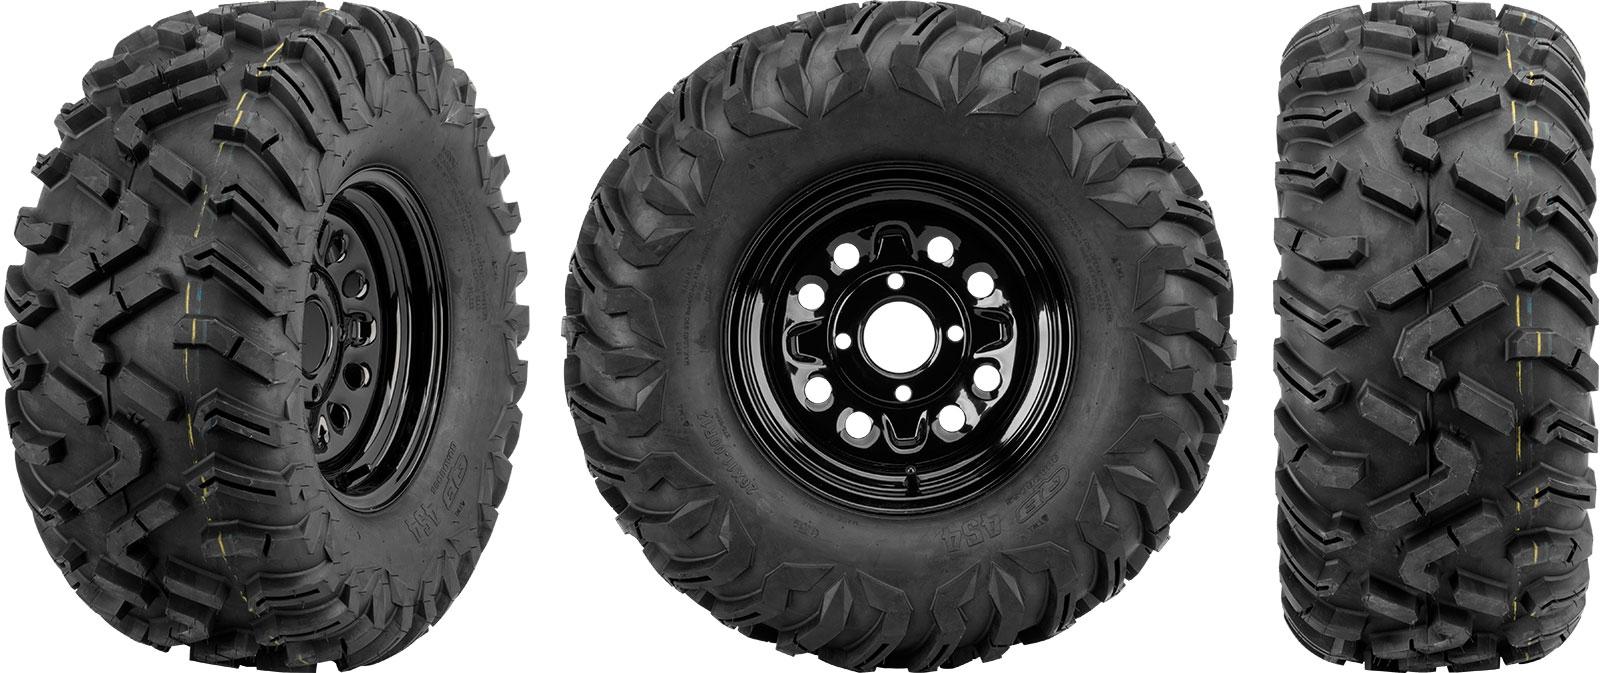 QBT454 Tire